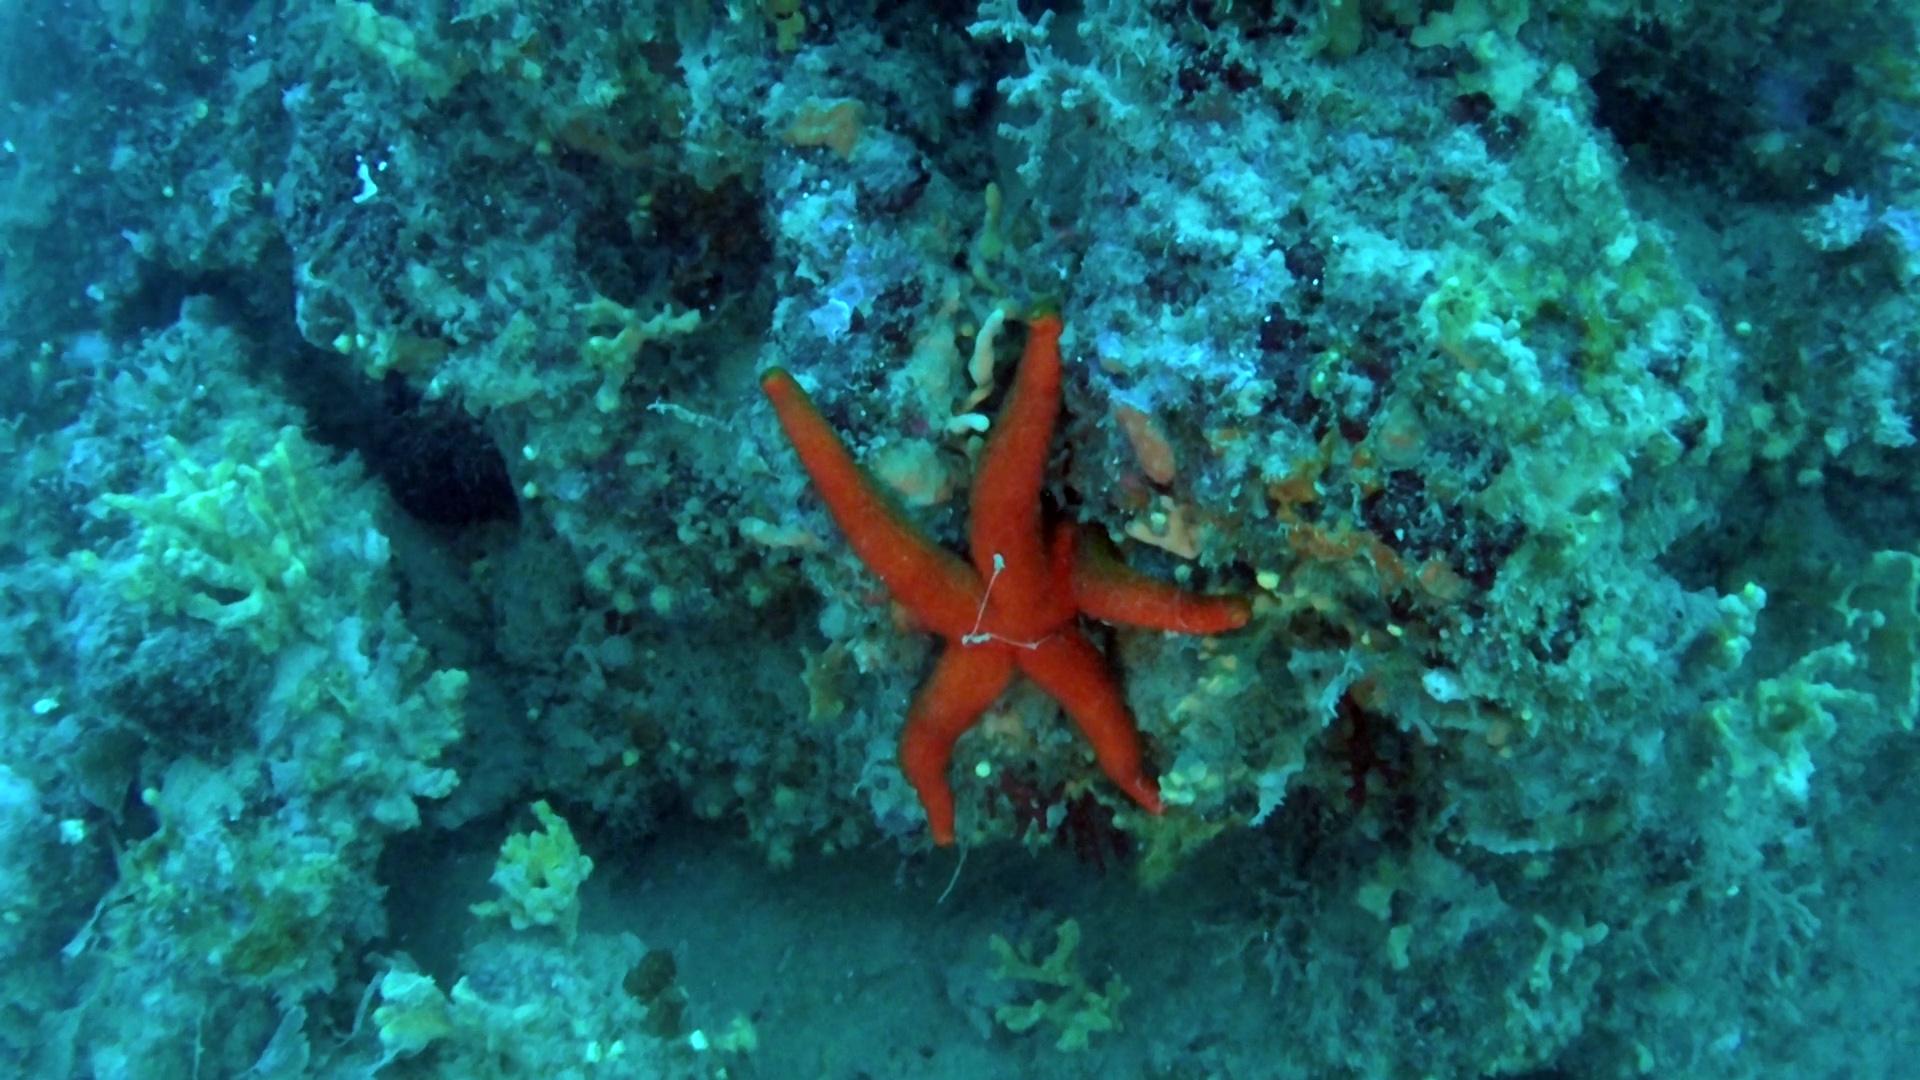 Mediterranean Red Seastar - Echinaster sepositus